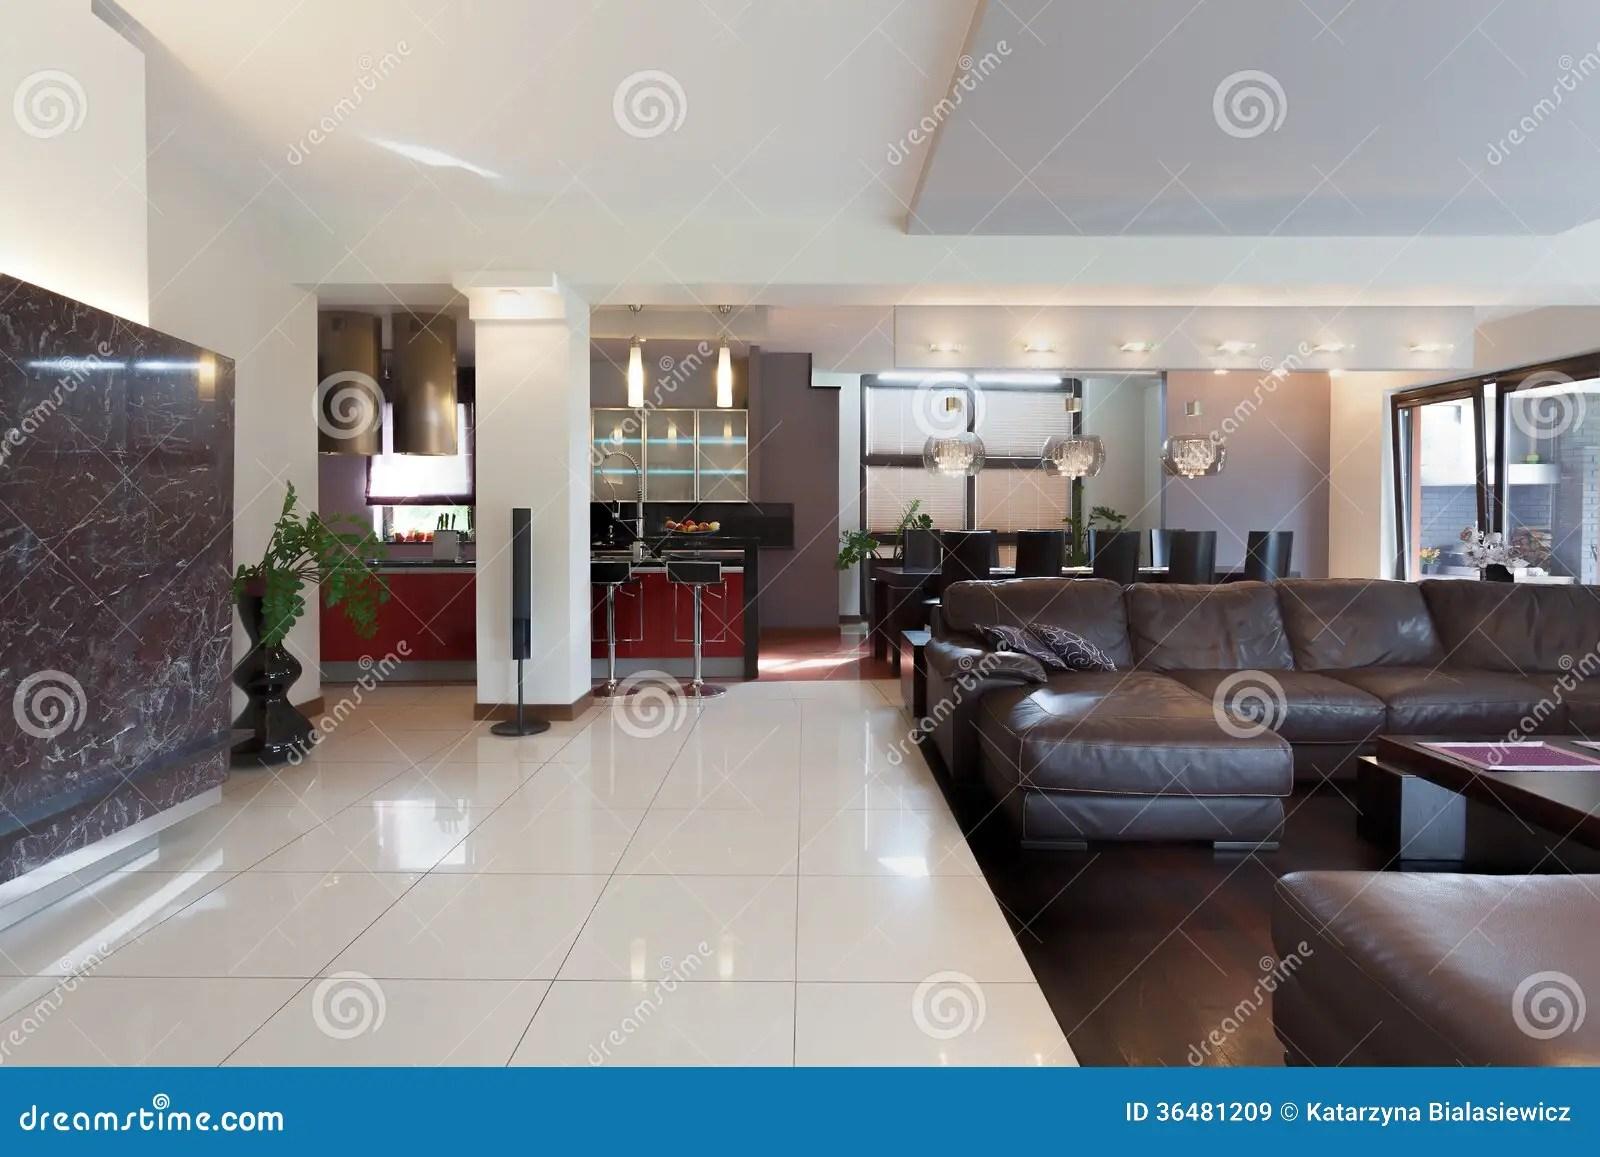 Cucina Salone E Sala Da Pranzo Immagine Stock  Immagine 36481209